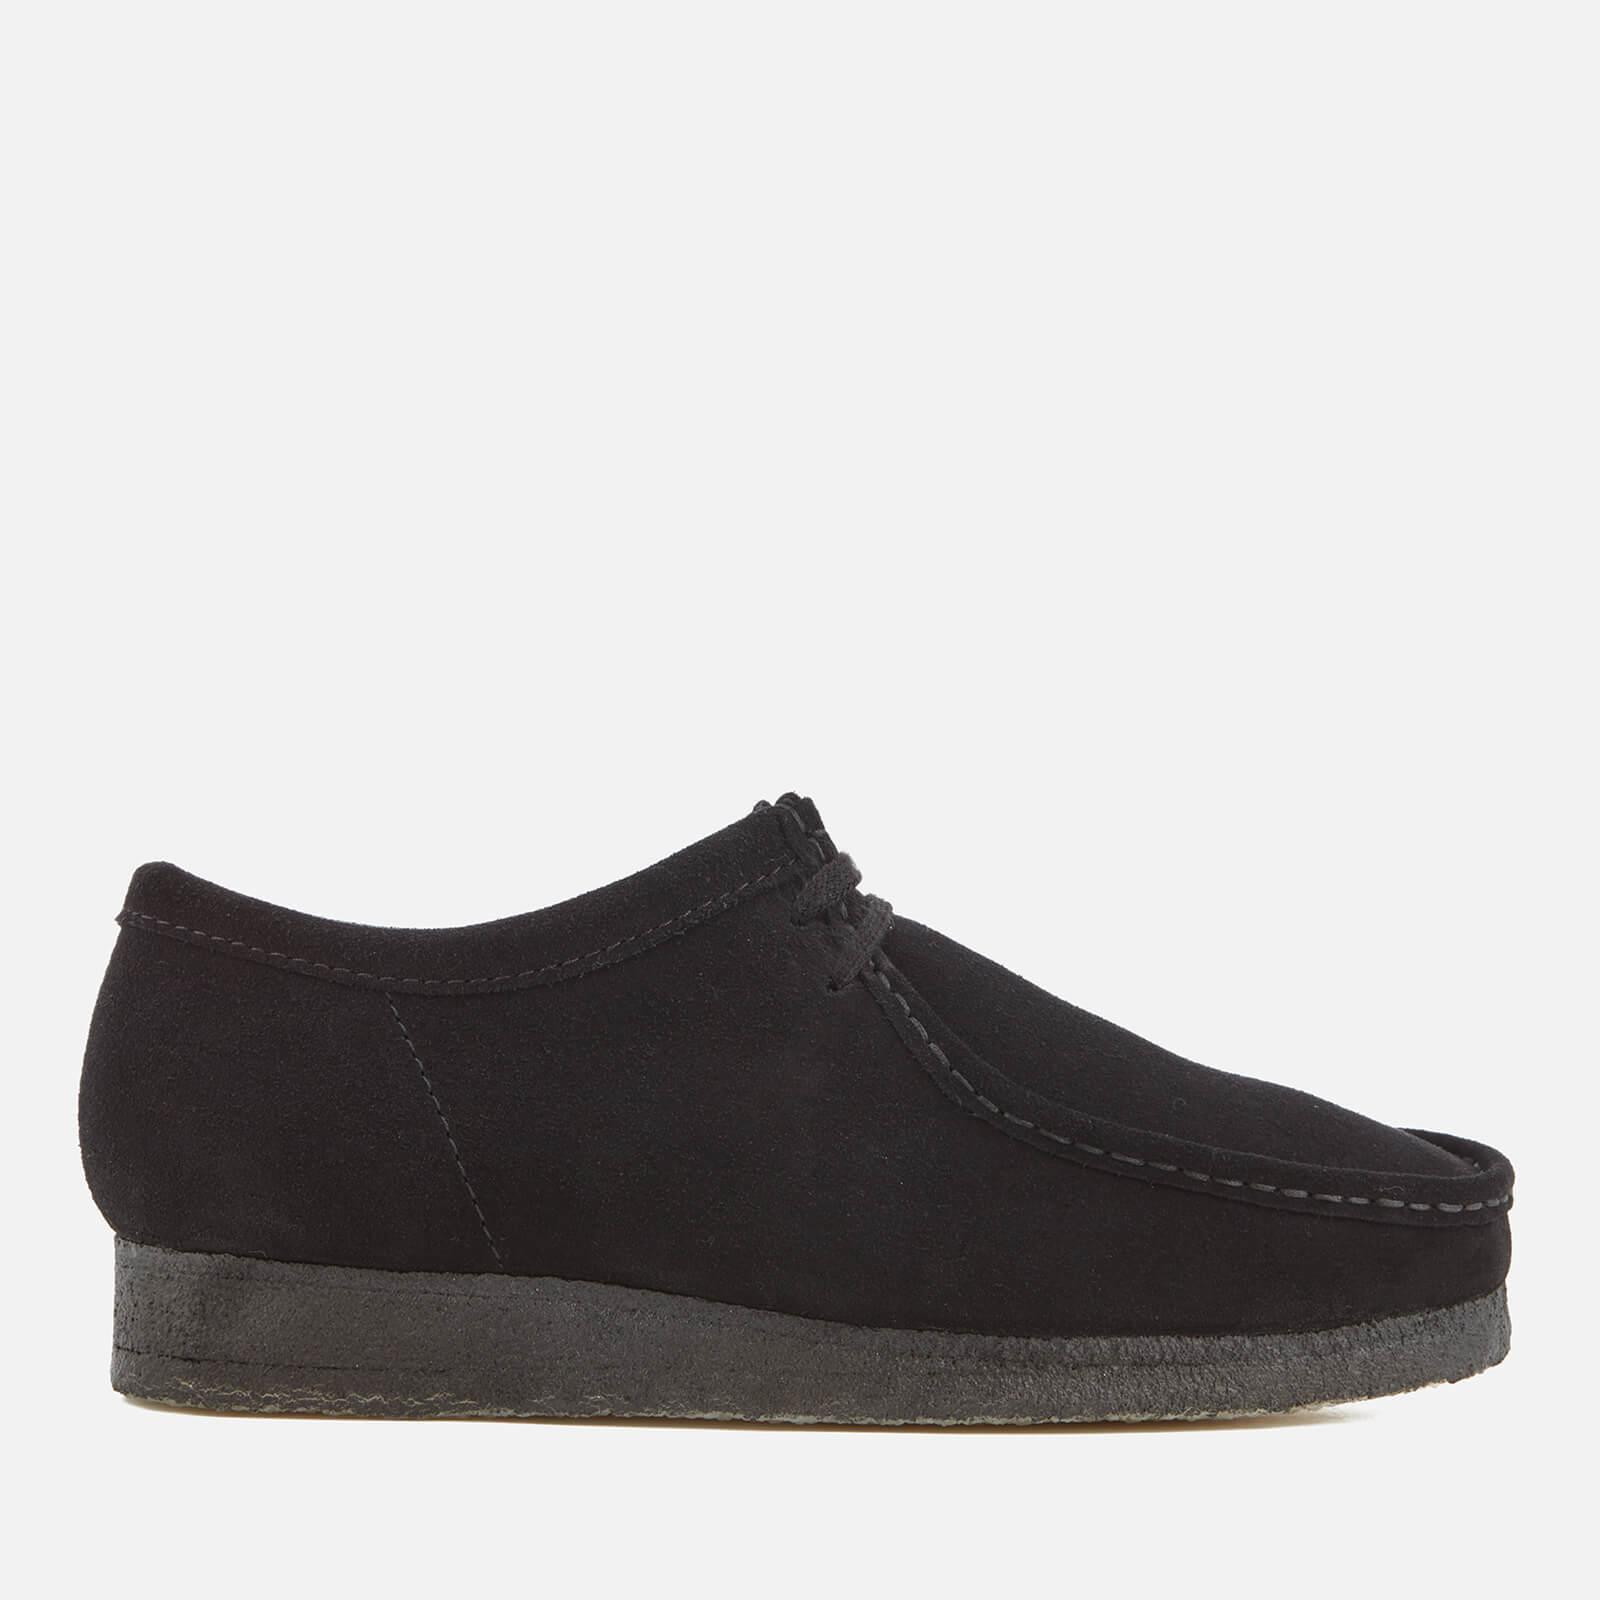 Clarks Originals Men's Wallabee Suede Shoes - Black - UK 7 - Black